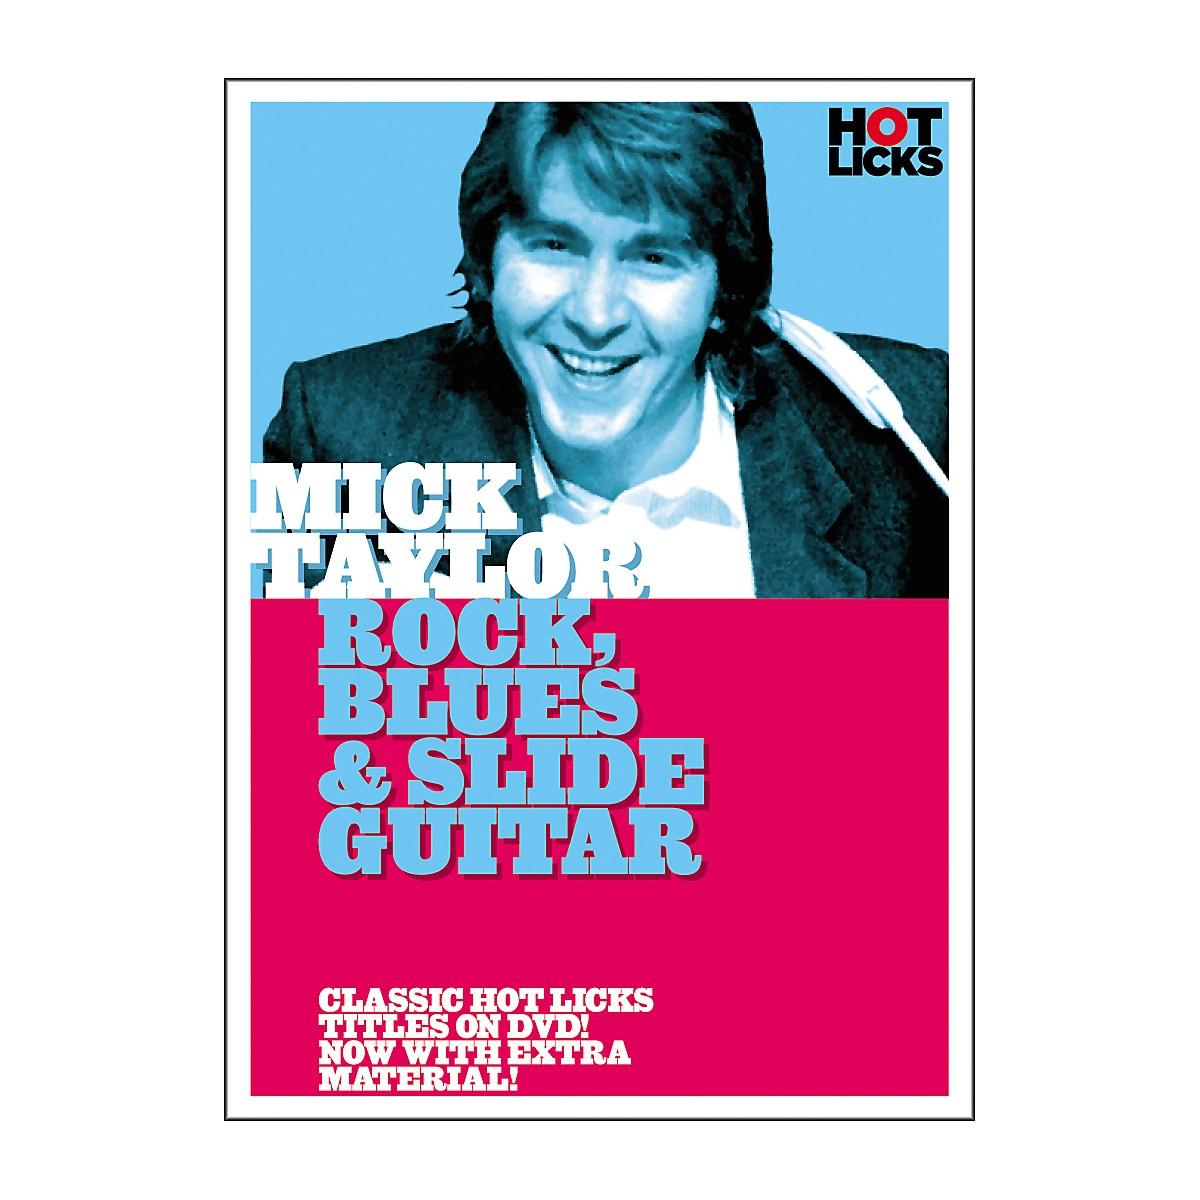 Hot Licks Mick Taylor: Rock Blues and Slide Guitar DVD